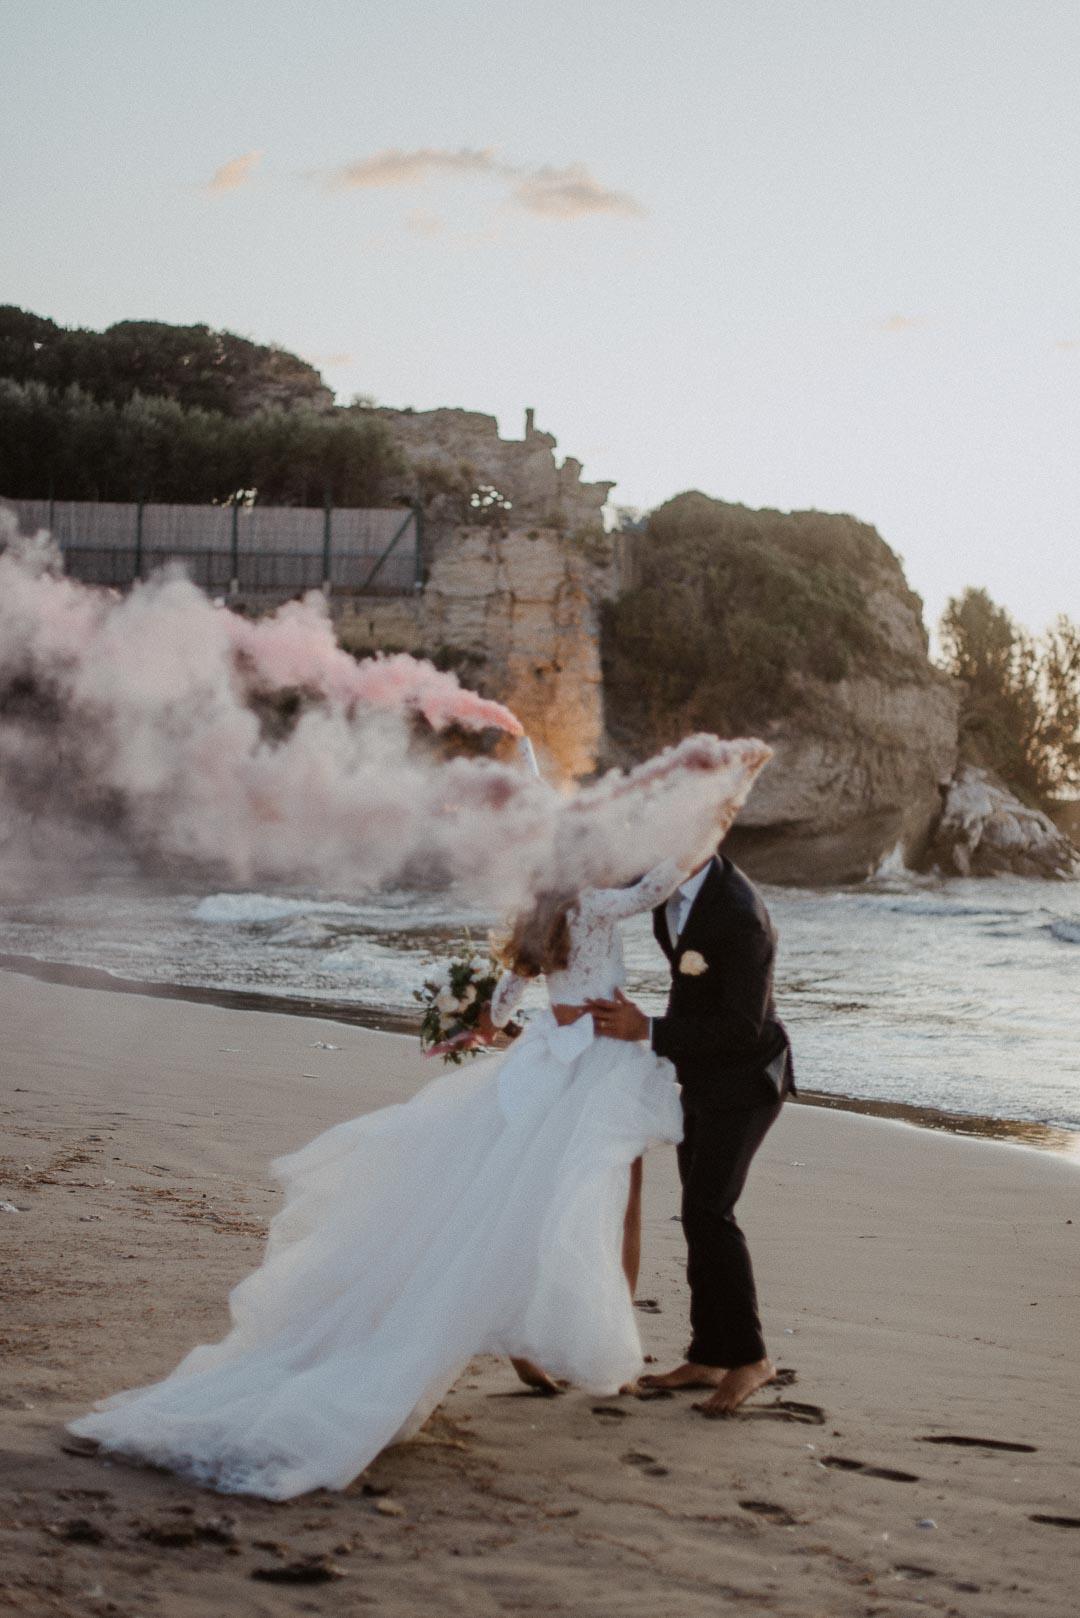 wedding-photographer-destination-fineart-bespoke-reportage-napoli-nabilah-vivianeizzo-spazio46-139